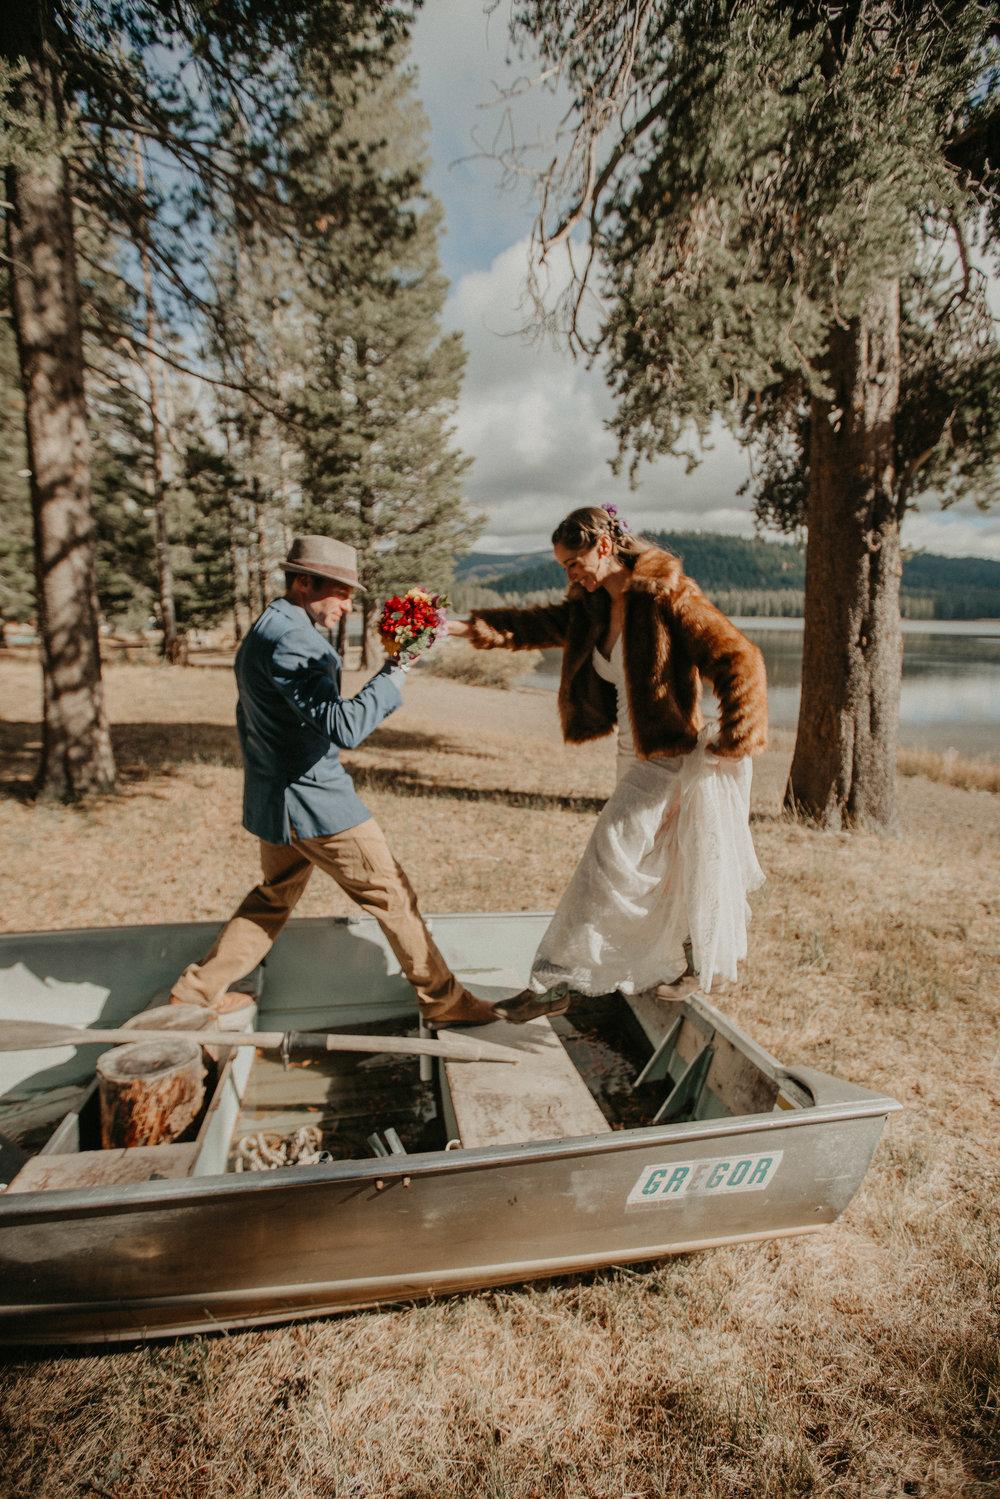 newlyweds lake tahoe canoe campground wedding planner